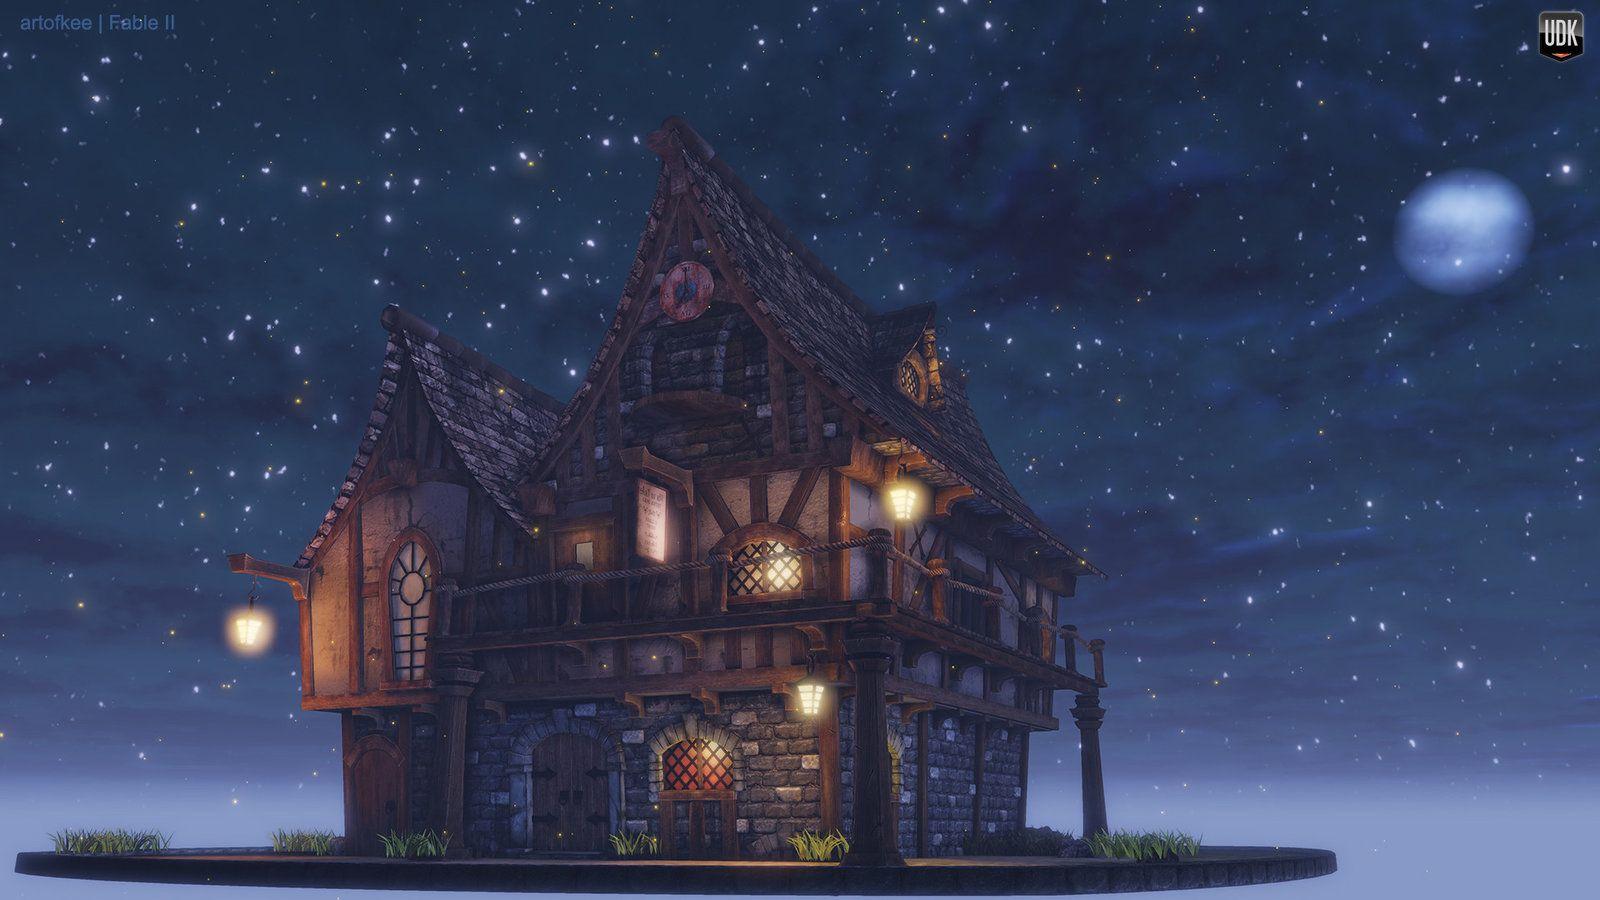 Fable II Tavern House Fanart, Kee Mahusay on ArtStation at https://www.artstation.com/artwork/fable-ii-tavern-house-fanart